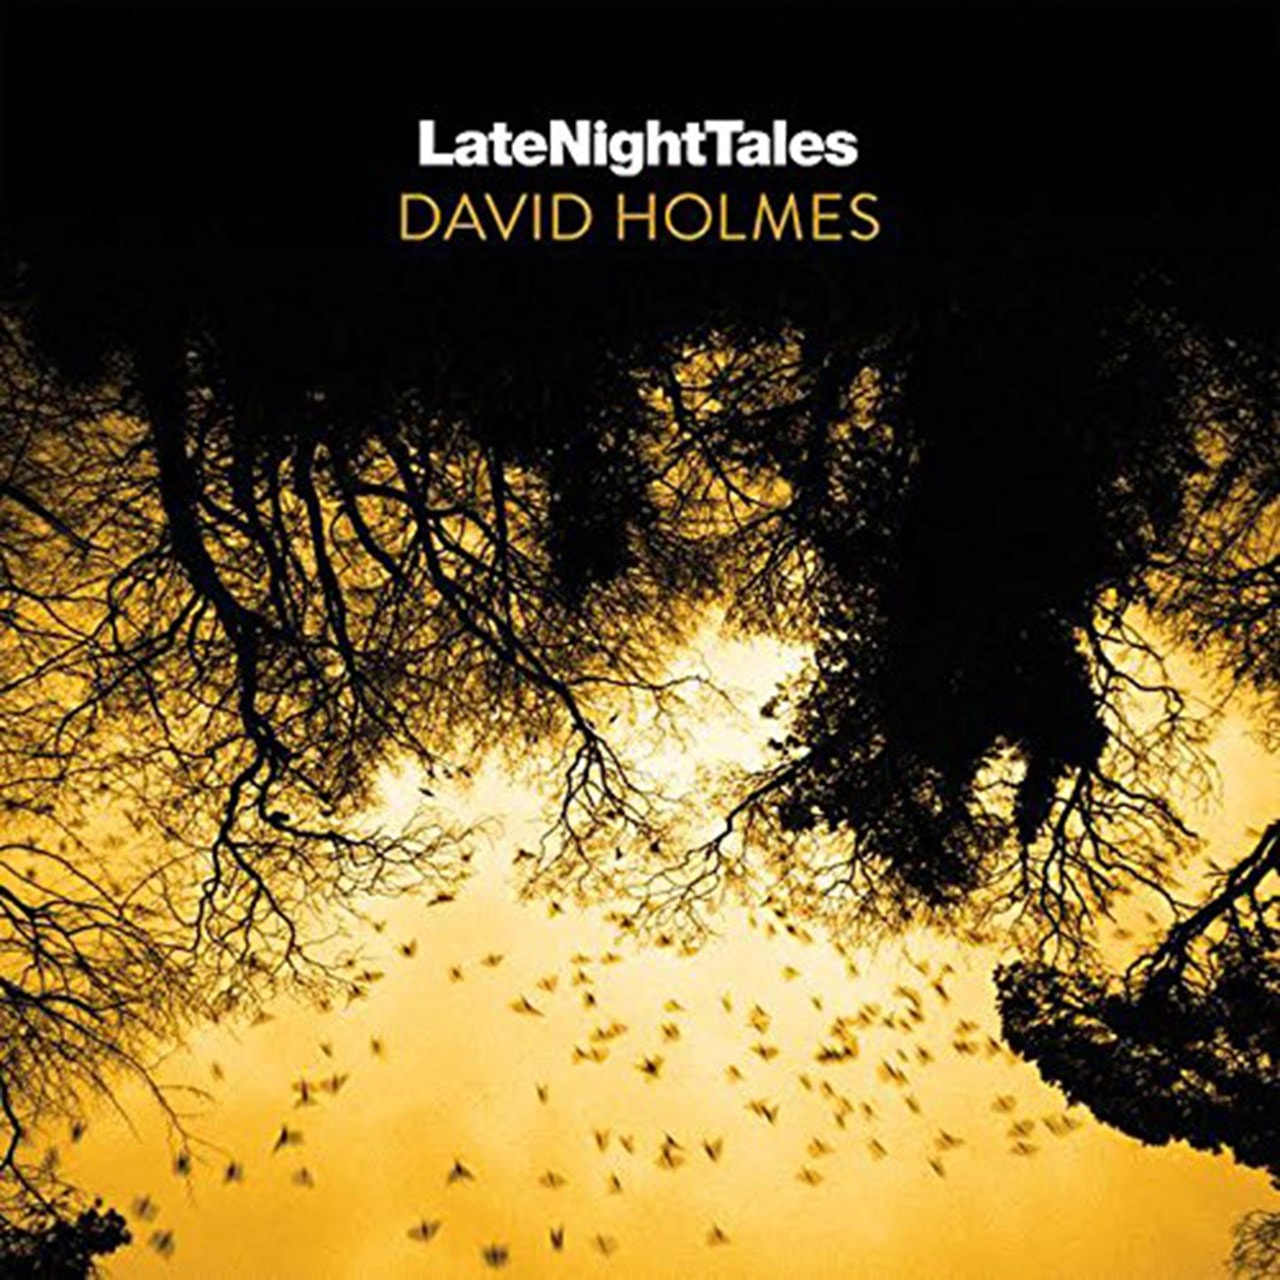 Late Night Tales: David Holmes - 1